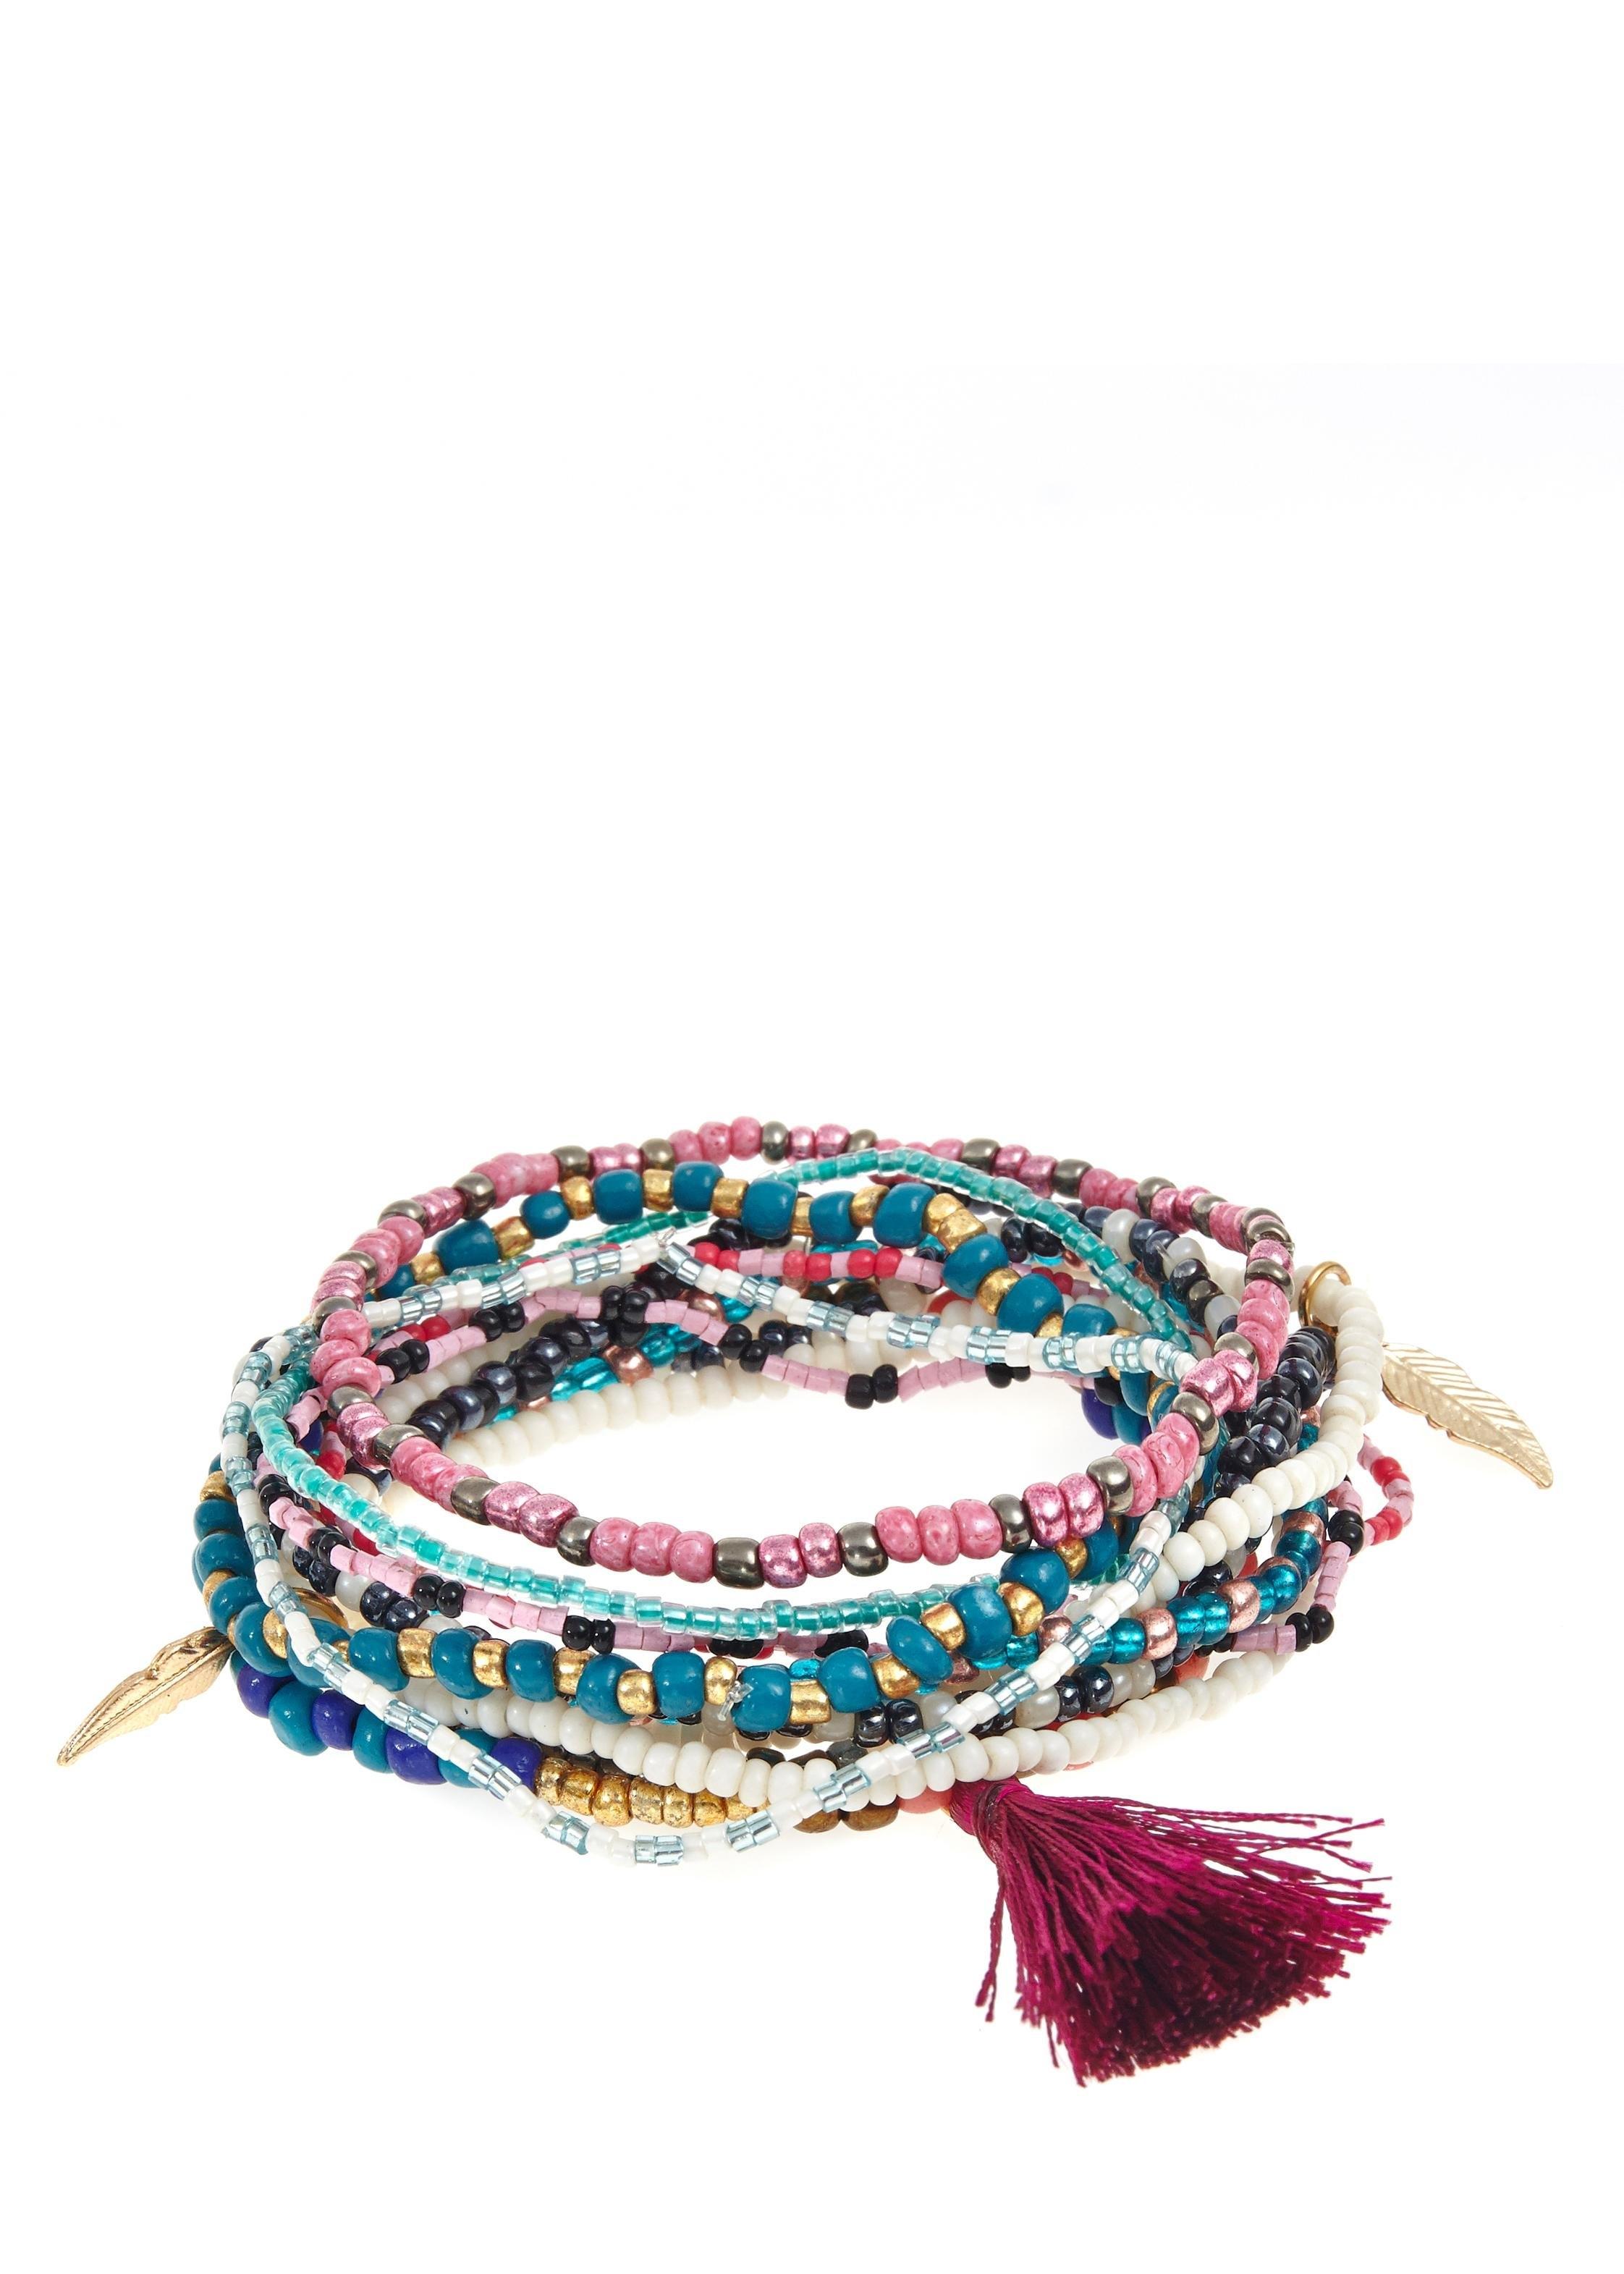 LASCANA armbandenset (12-delig) goedkoop op lascana.nl kopen